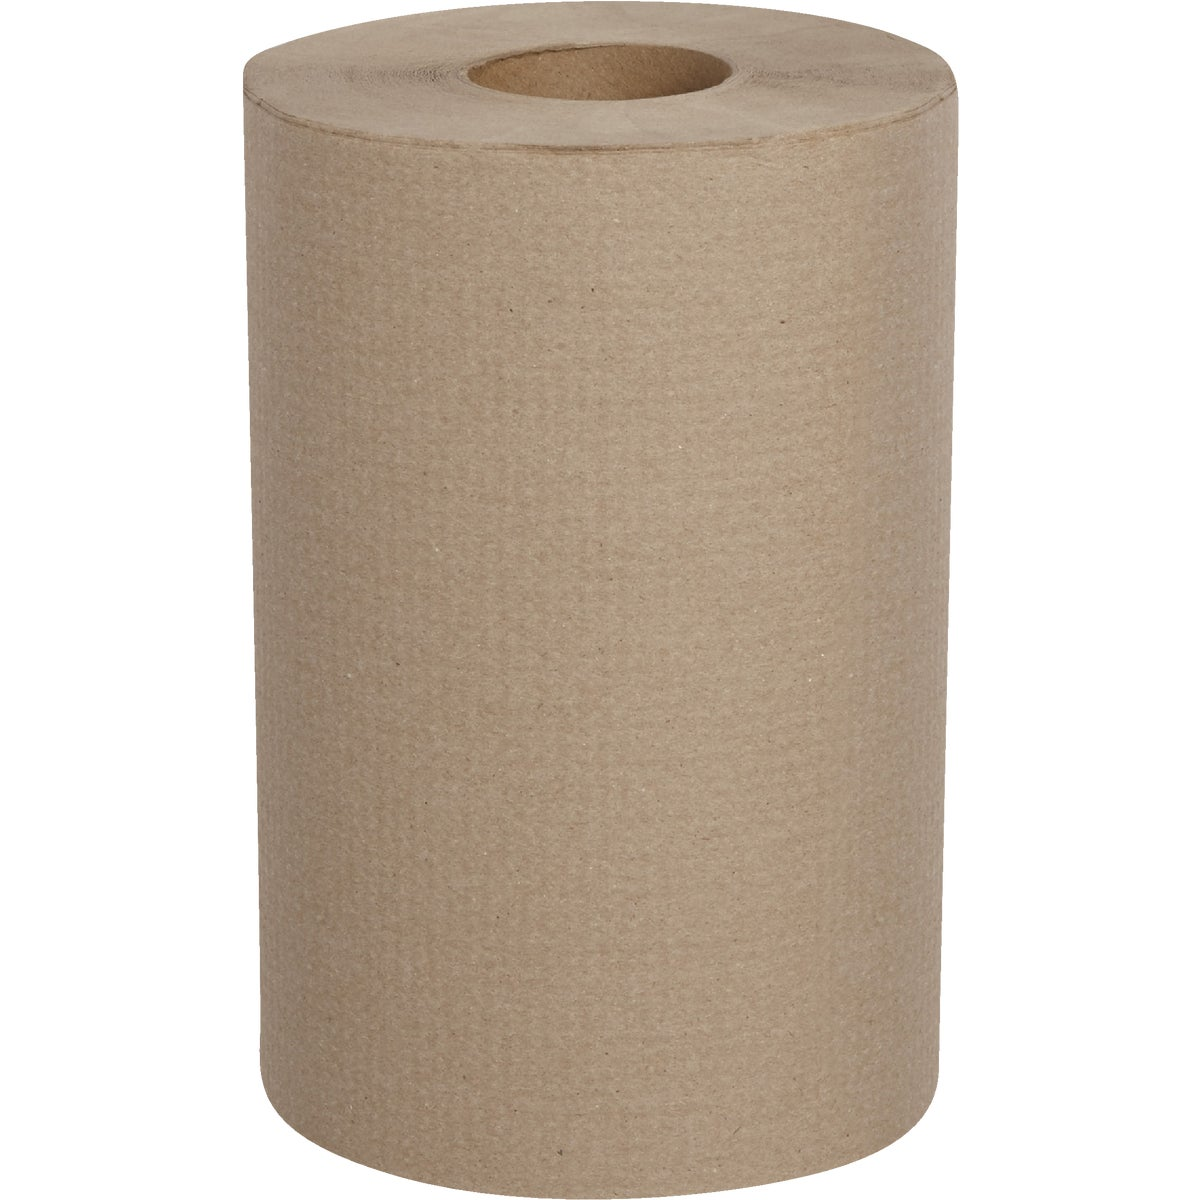 Towel Roll